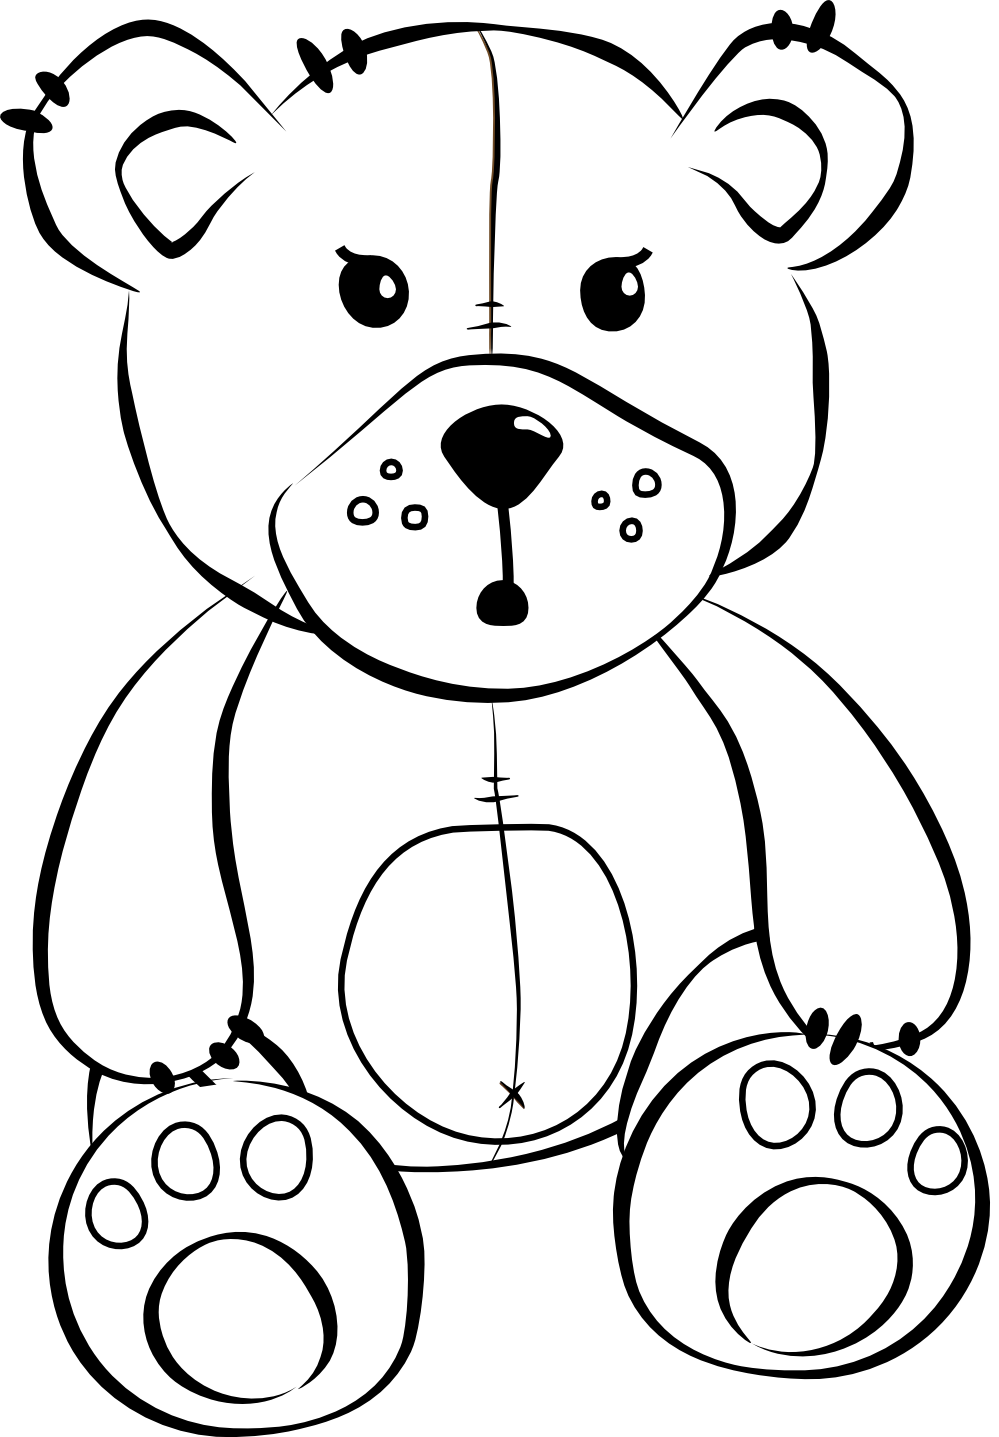 Teddy clipart stuffed animal #11